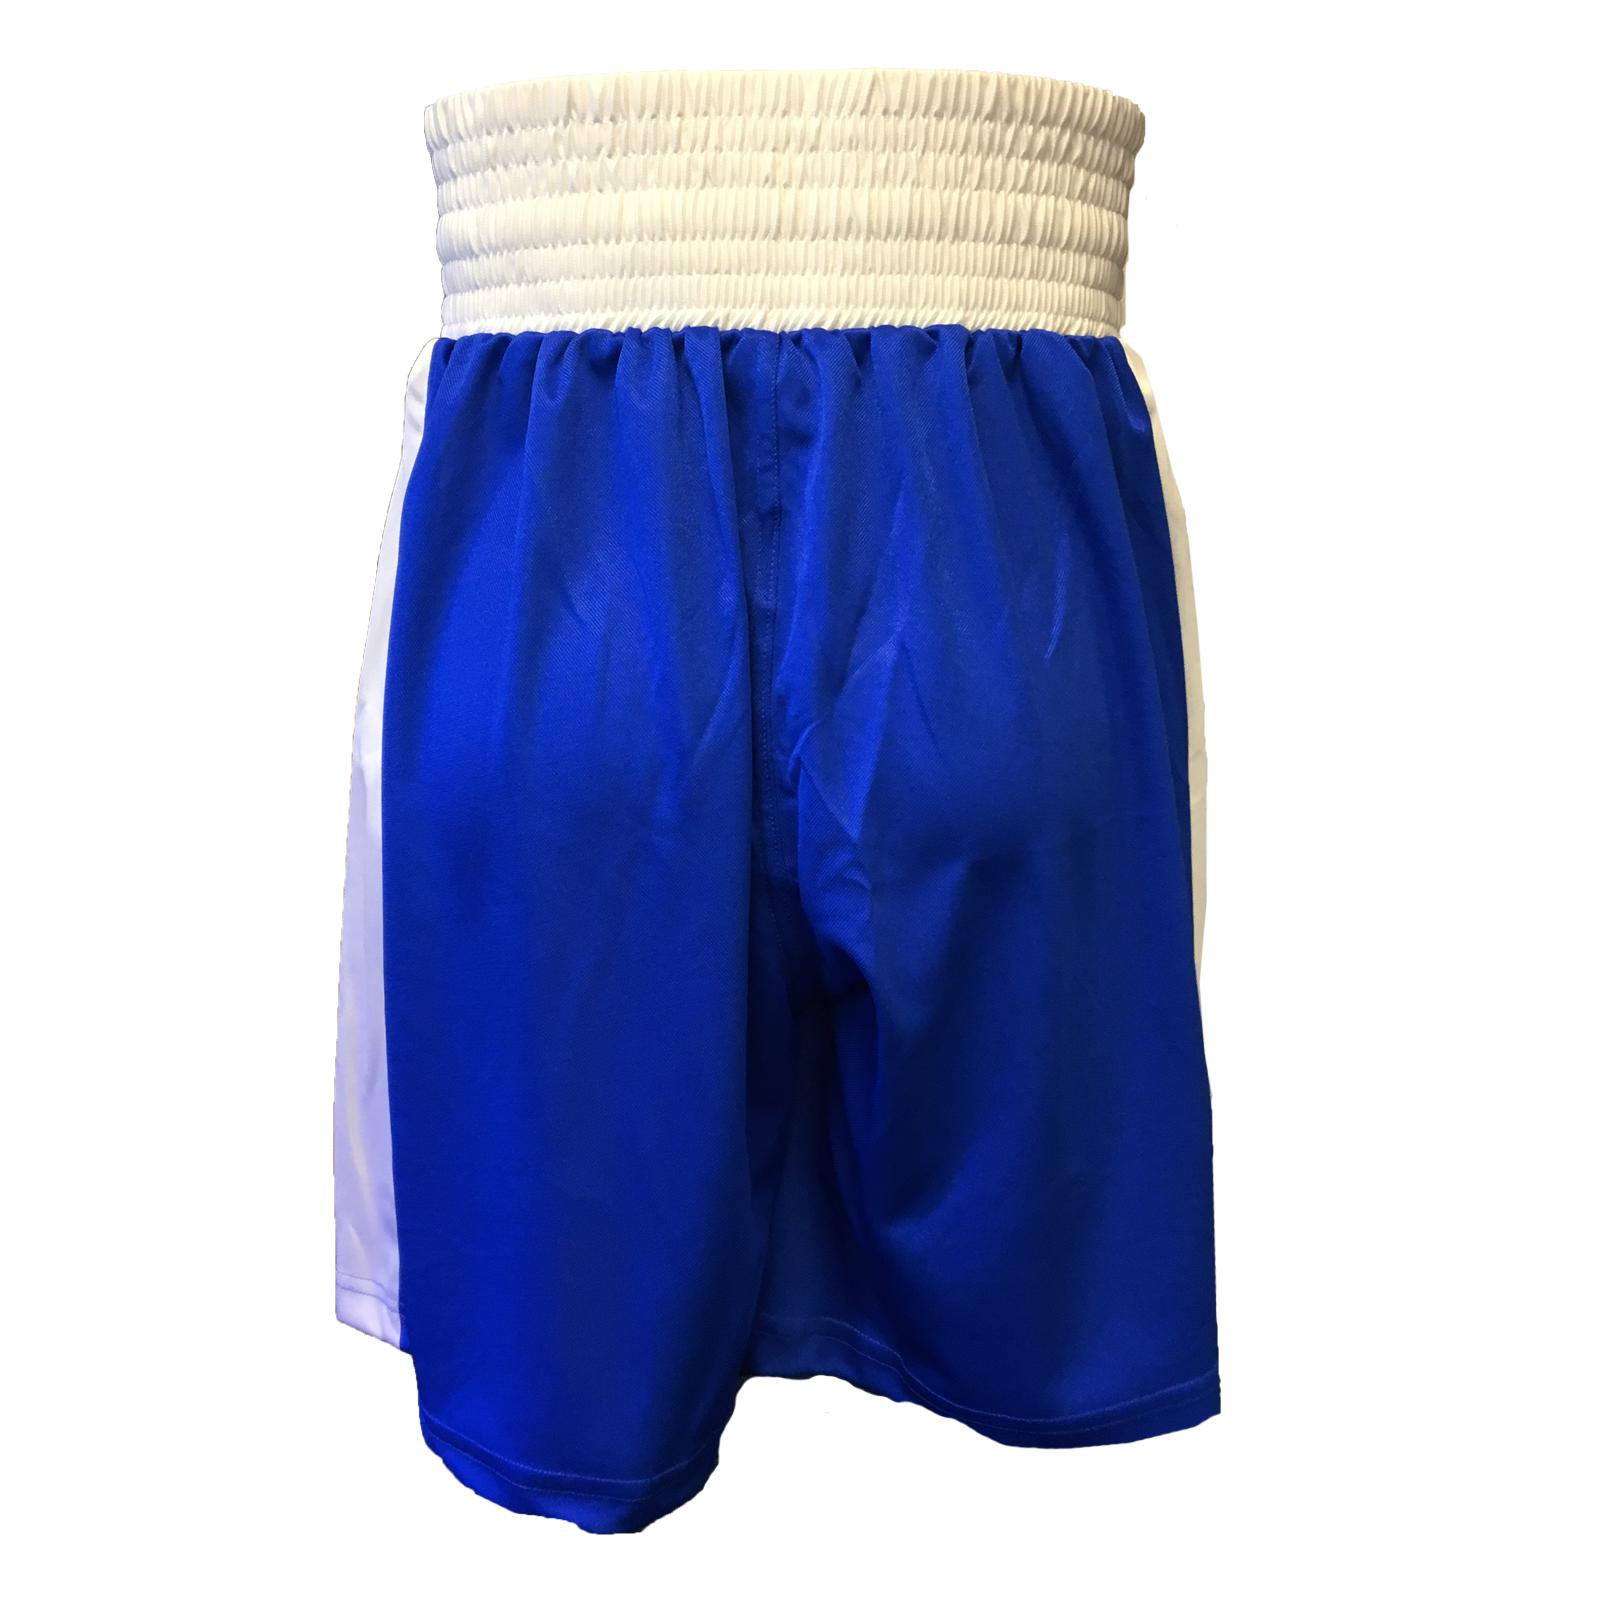 TUF WEAR KIDS JUNIOR CLUB BOXING SHORTS BLUE